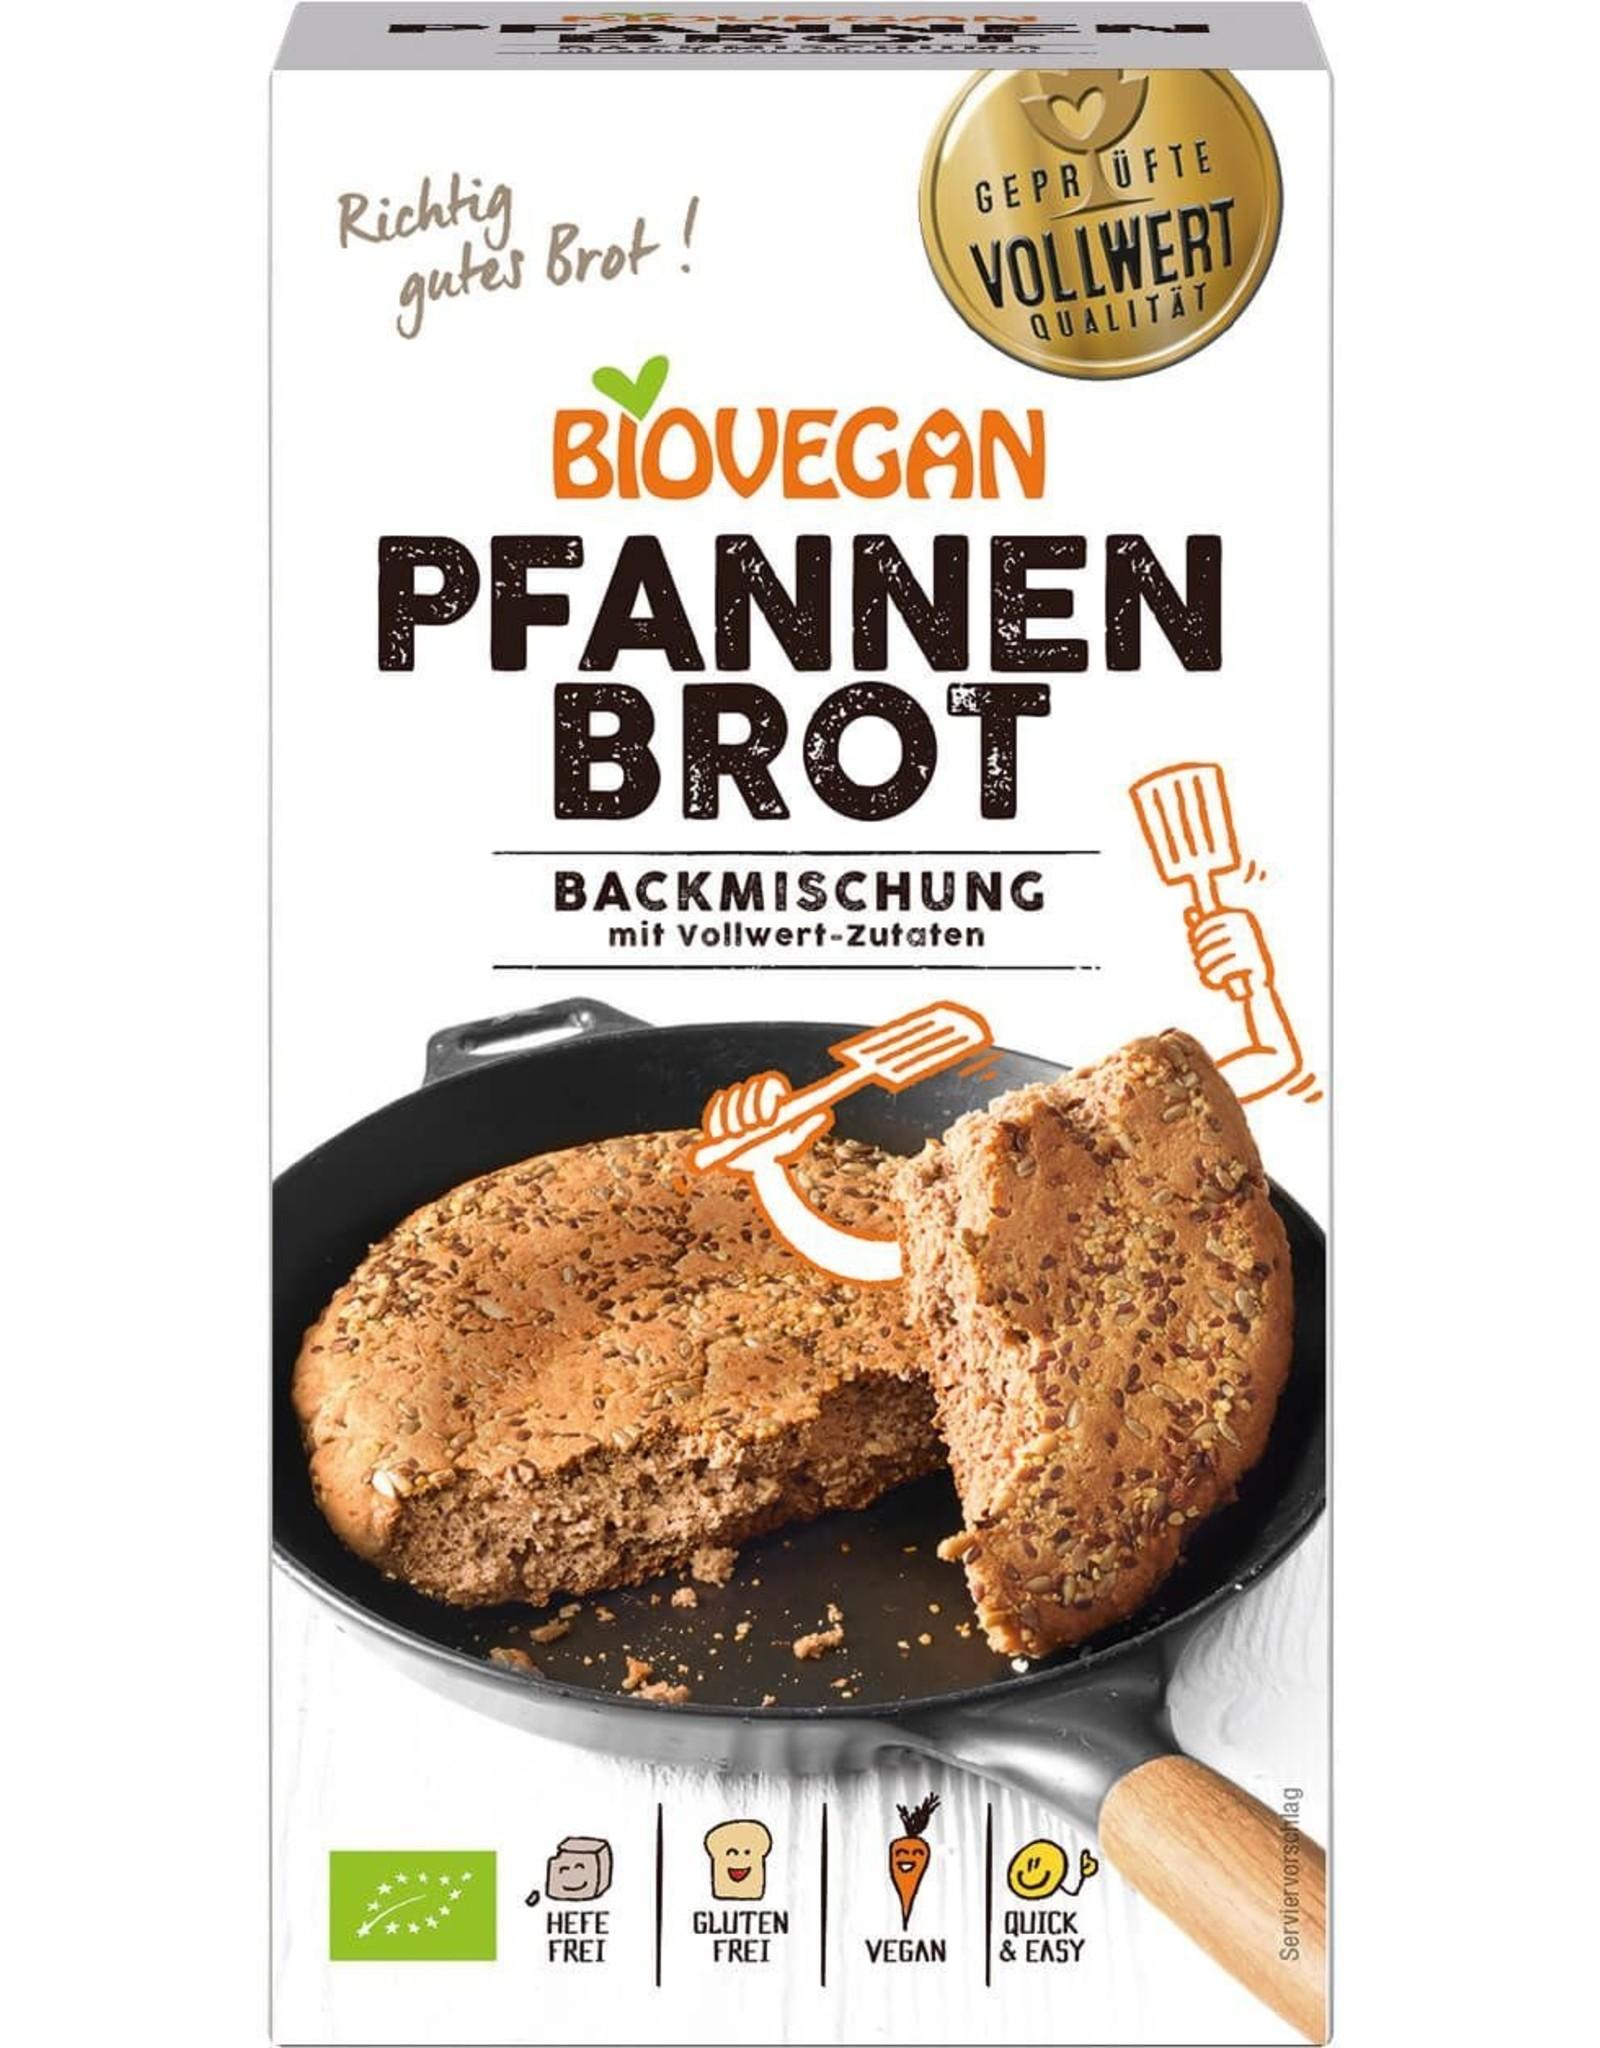 BIOVEGAN Brotbackmischung Pfanne, BIO, 330g